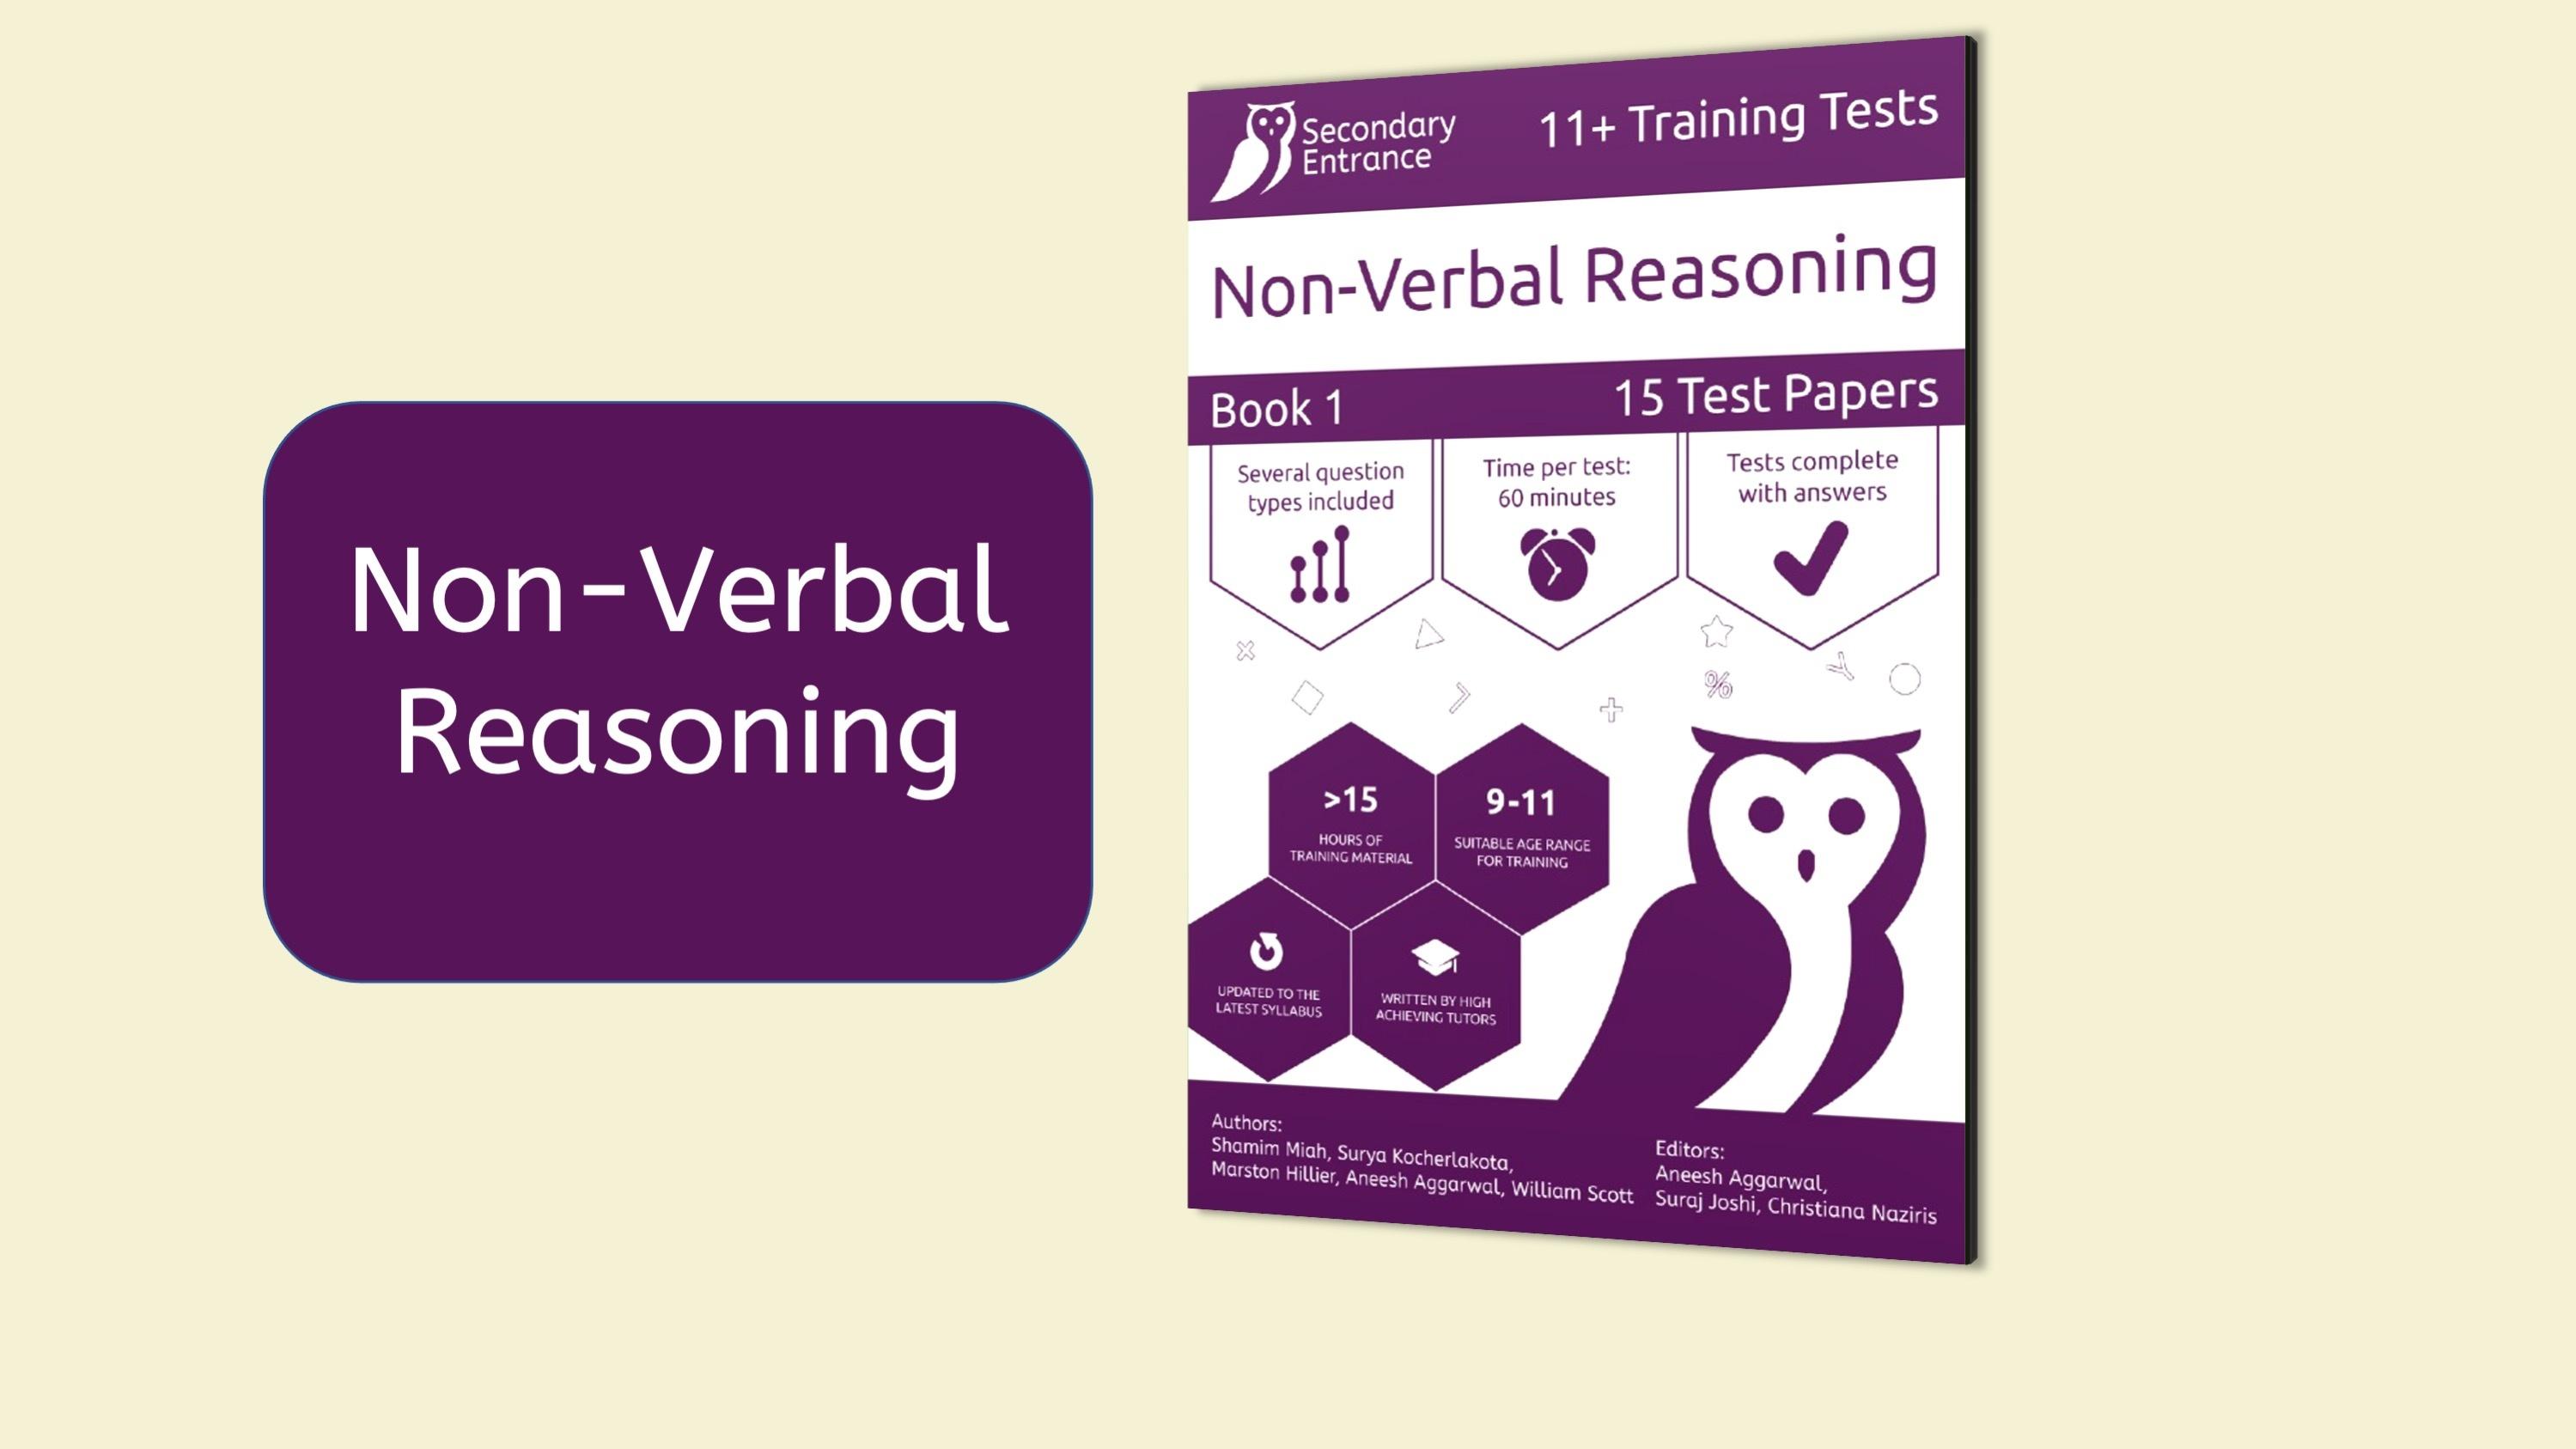 Non-Verbal Reasoning Courses